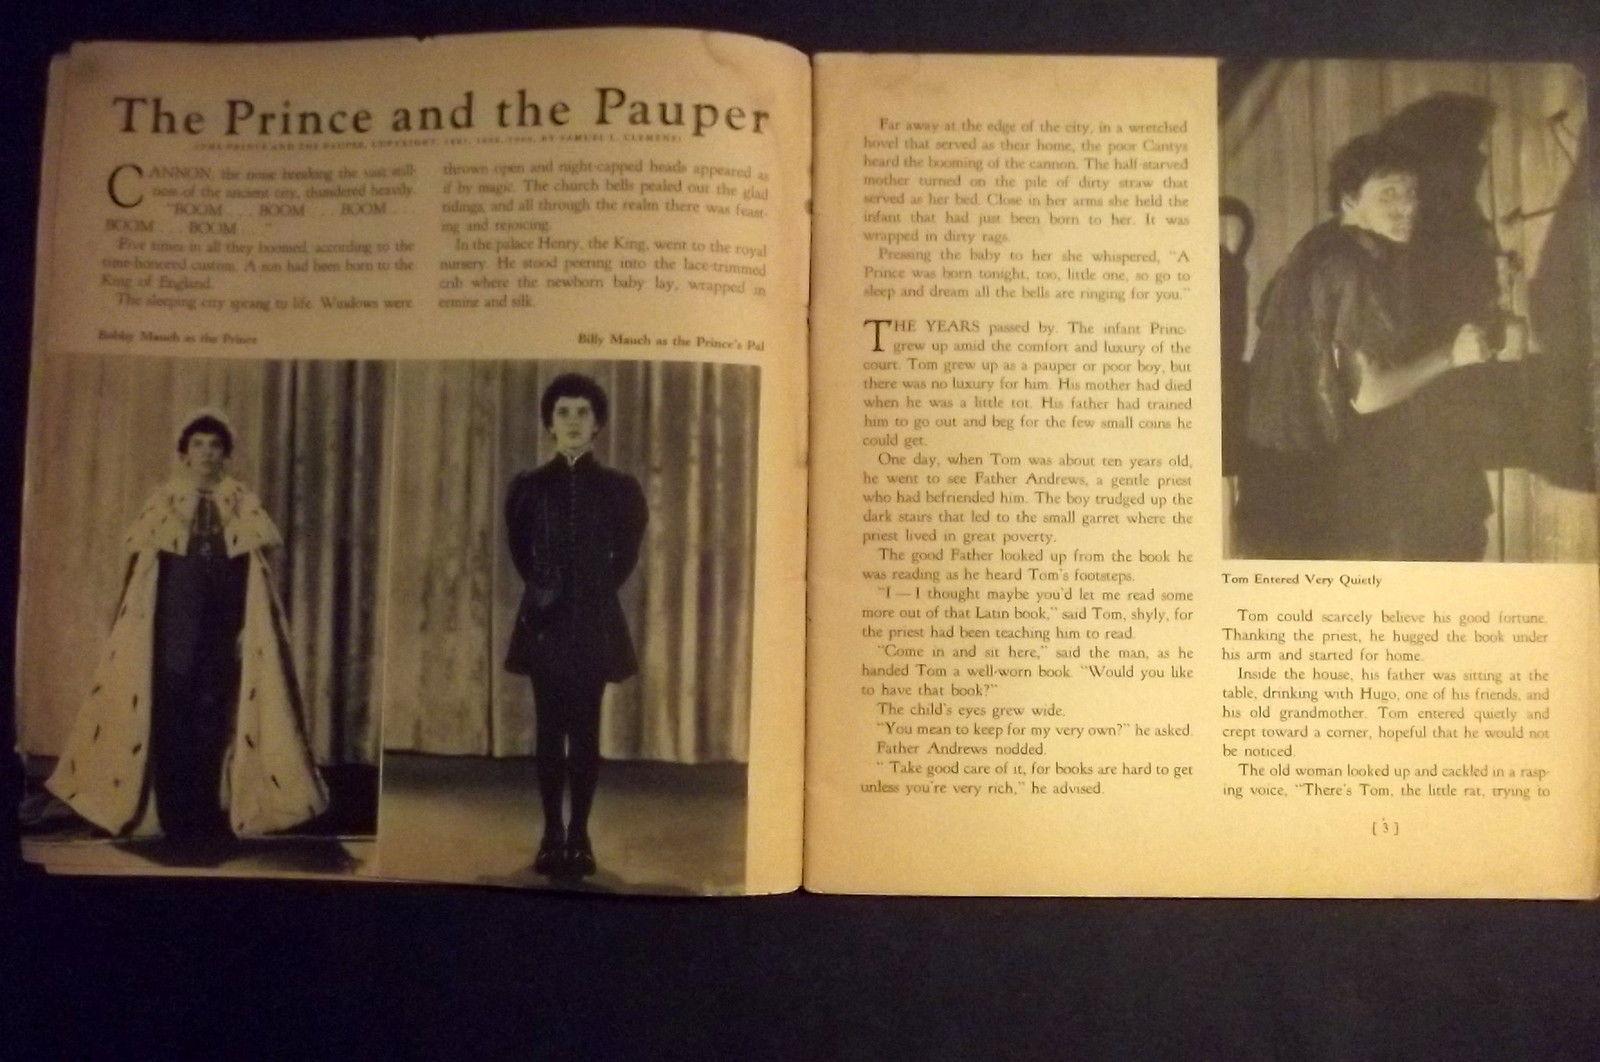 ERROL FLYNN  (PRINCE AND THE PAUPER) ORIGINAL 1937 PROGRAME